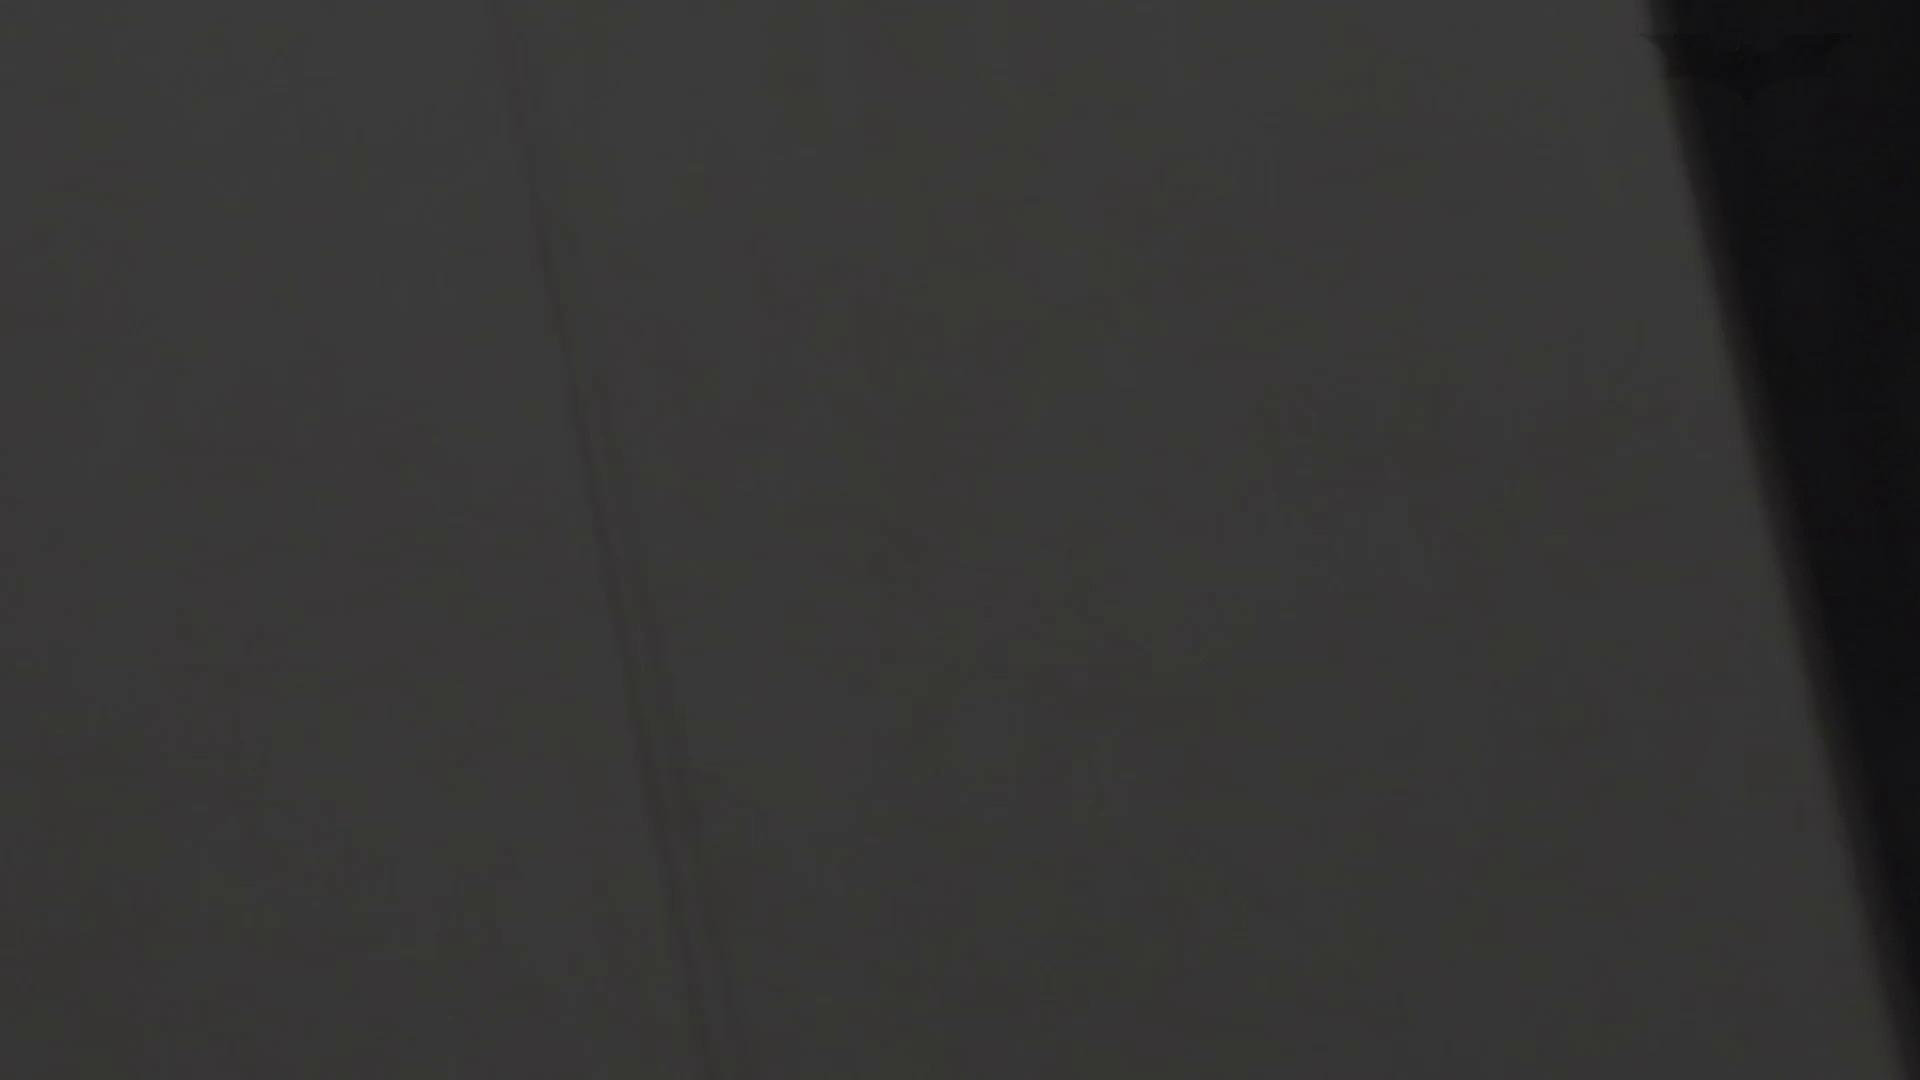 JD盗撮 美女の洗面所の秘密 Vol.73 盗撮大放出 ヌード画像 74連発 21